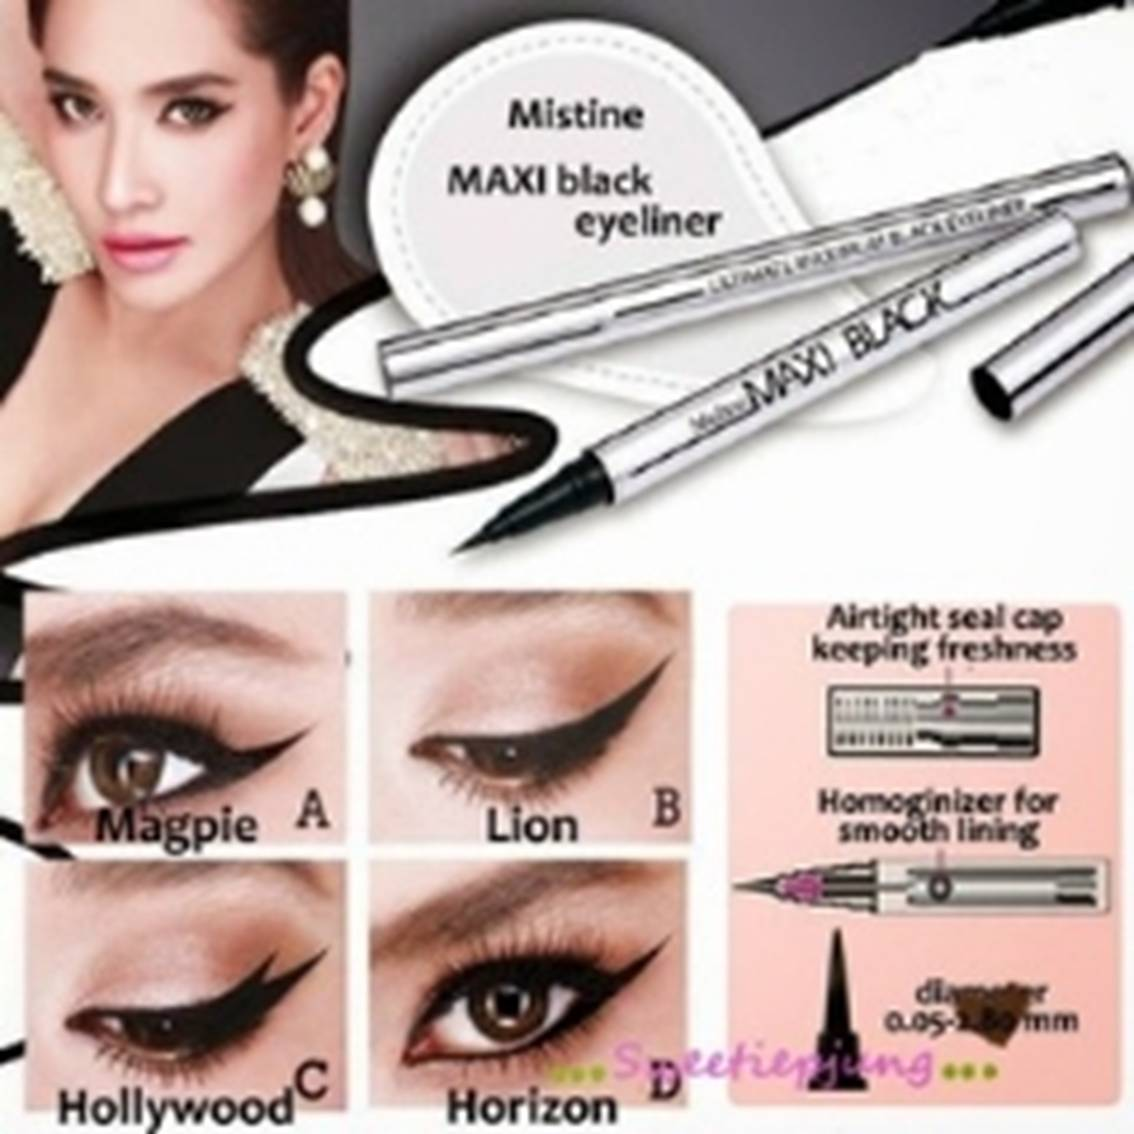 <br/><br/> 泰國 MISTINE 眼線液 -MAXI BLACK 全效眼線液筆 (黑色) 銀管【樂活生活館】<br/><br/>